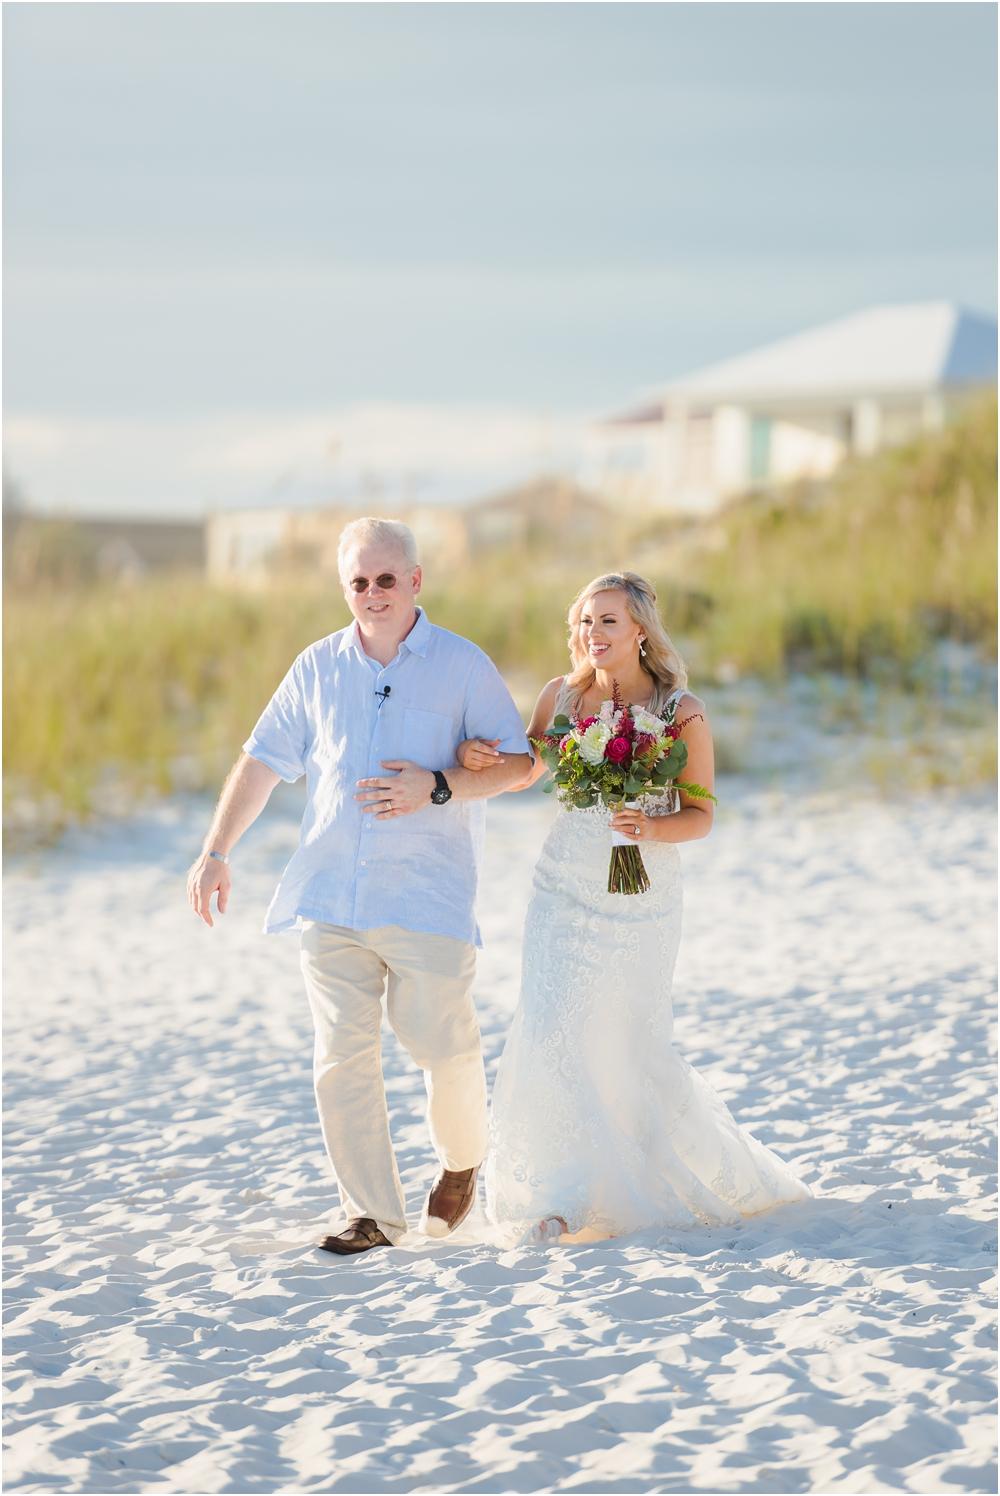 mcglothlin-wedding-kiersten-stevenson-photography-30a-panama-city-beach-dothan-tallahassee-(77-of-145).jpg